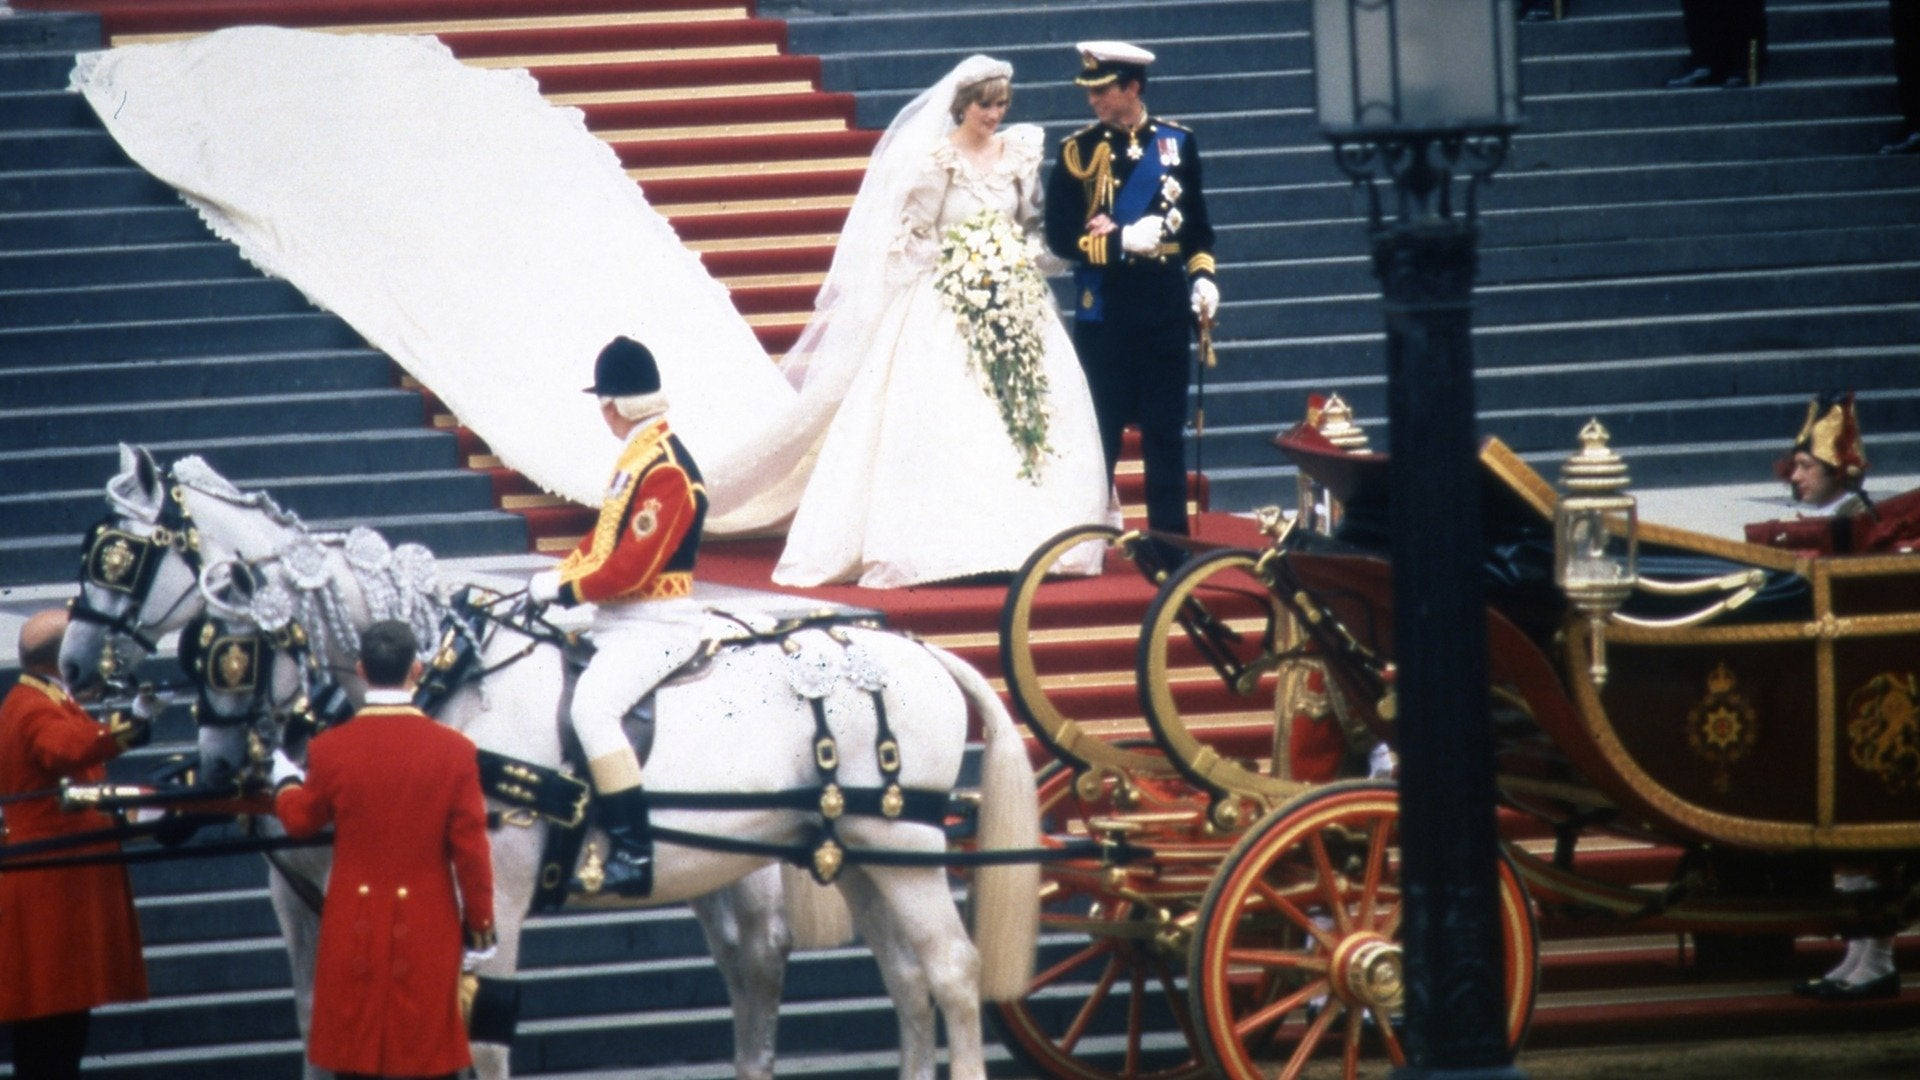 The Royal Wedding: Charles and Diana